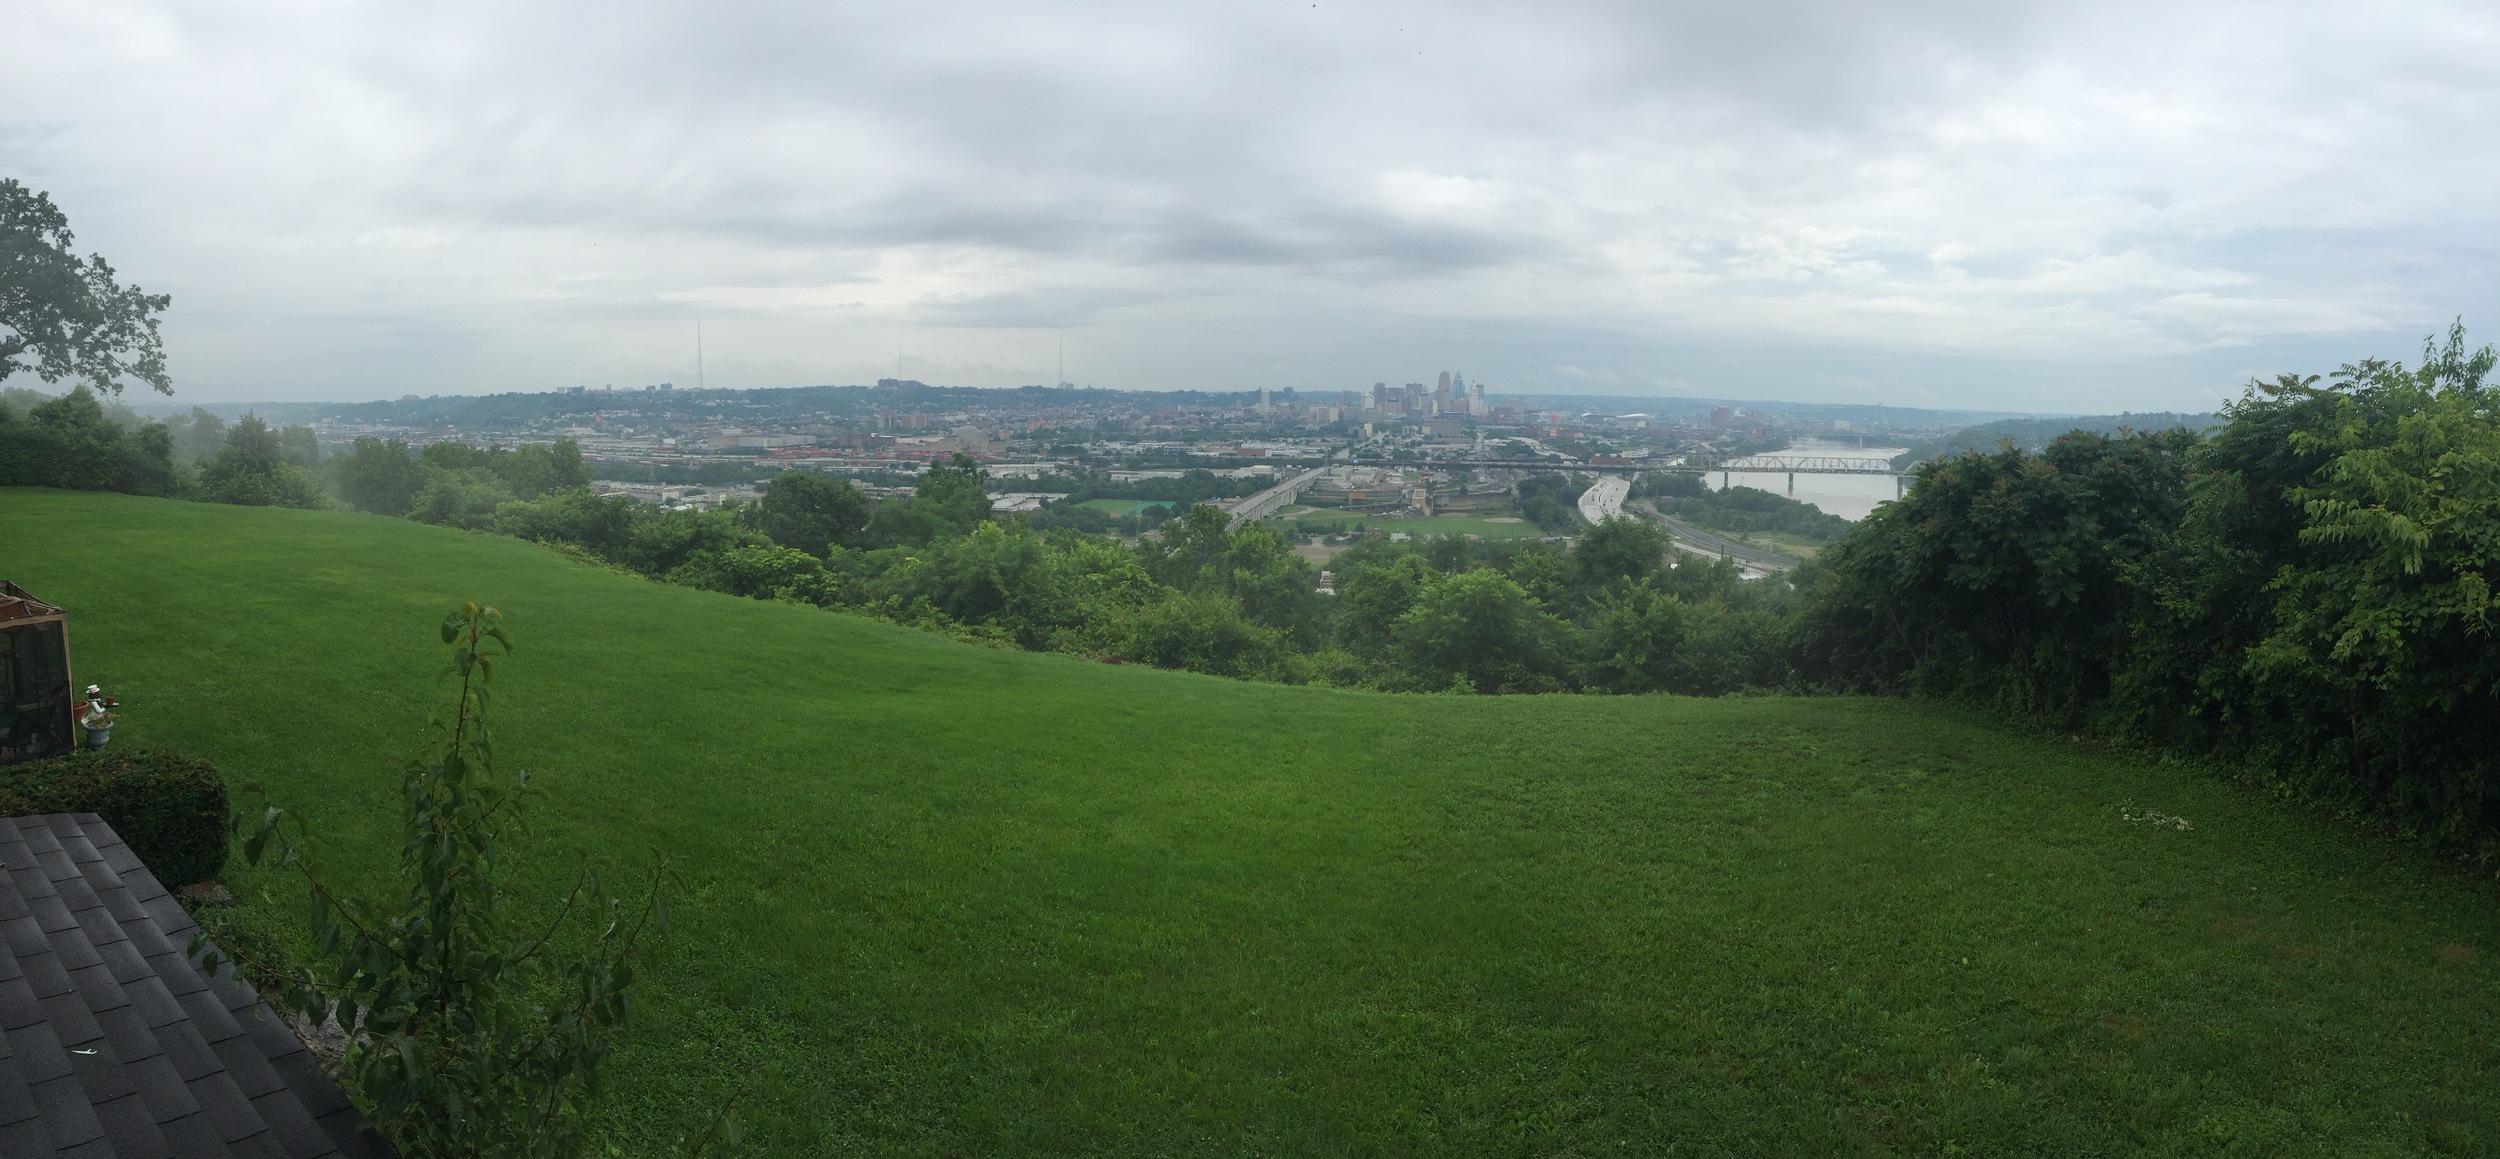 The Million Dollar View